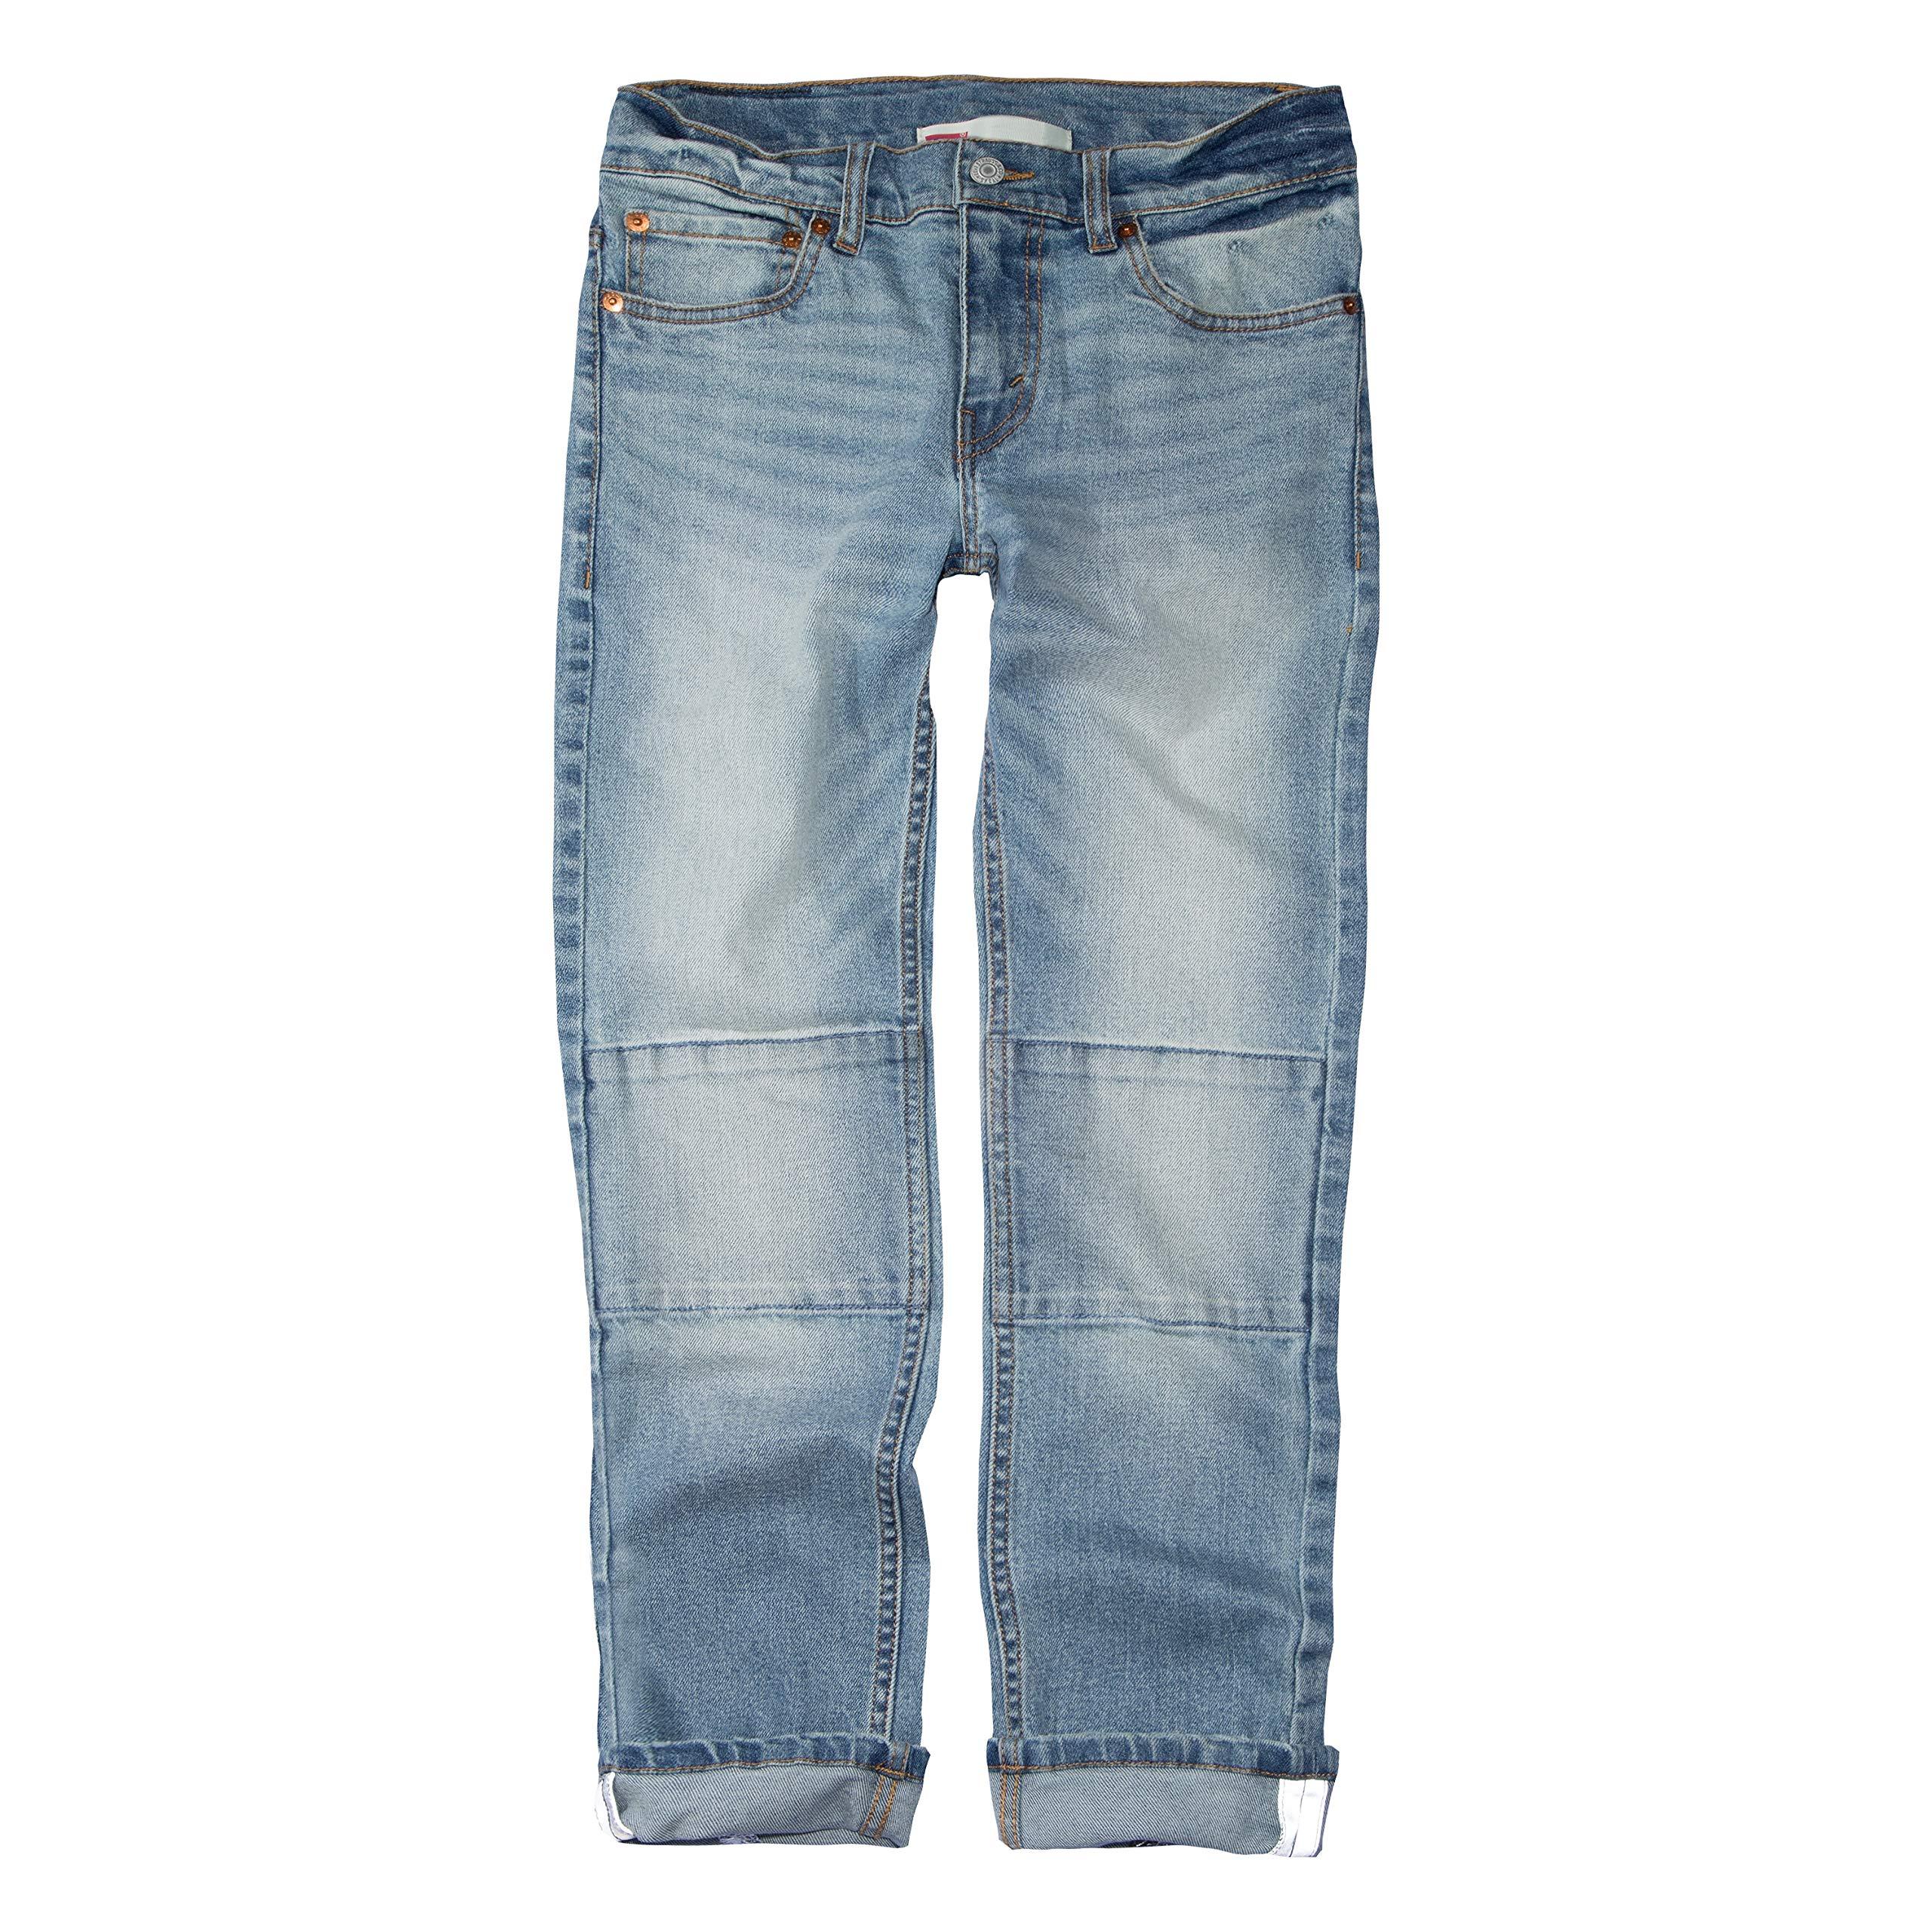 Levi's Boys' Big 511 Slim Fit Double Knee Jeans, Keanu 10